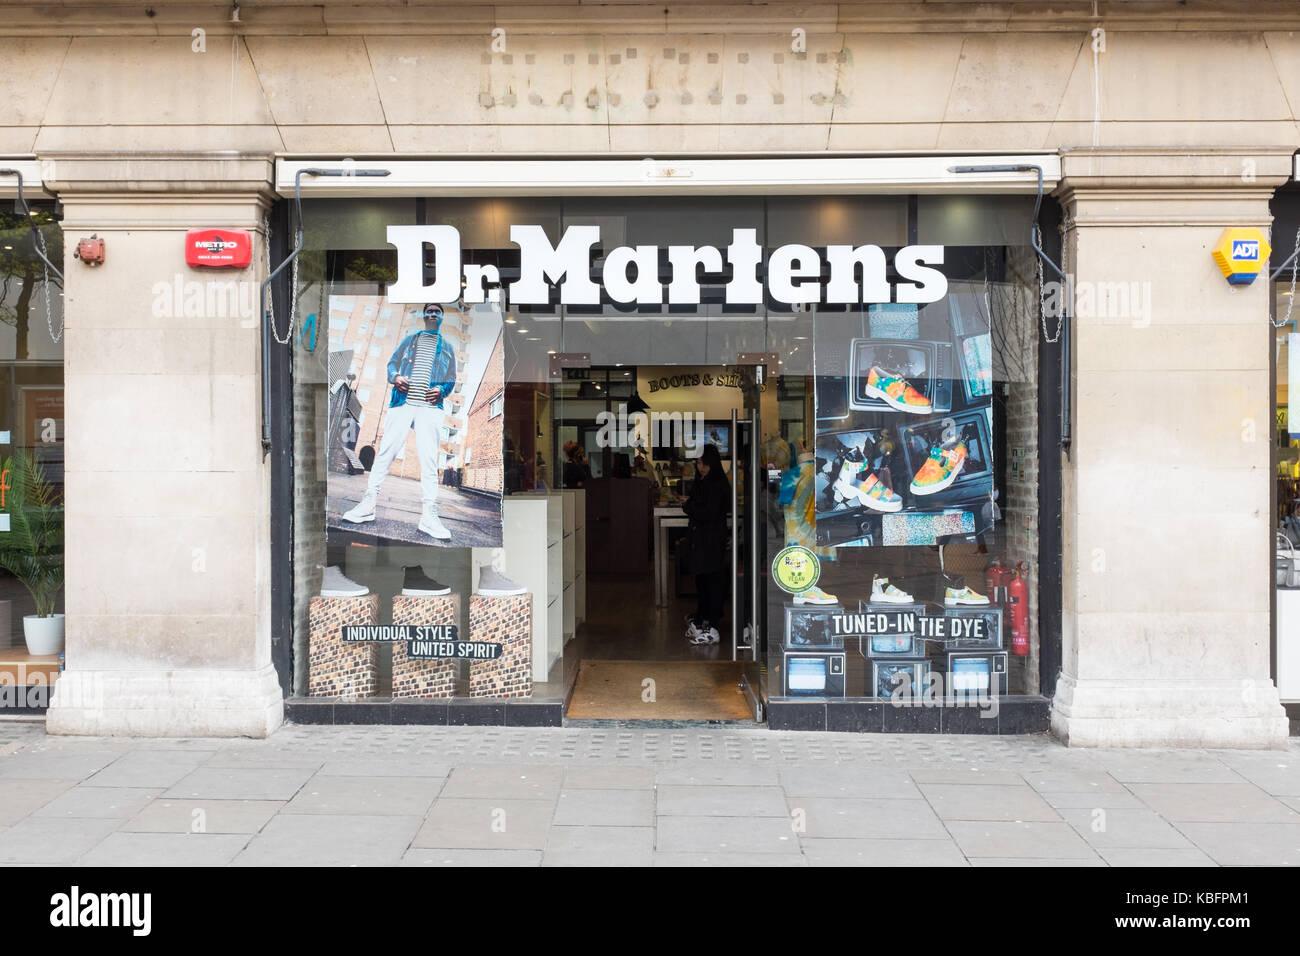 Dr Martens Shop High Resolution Stock